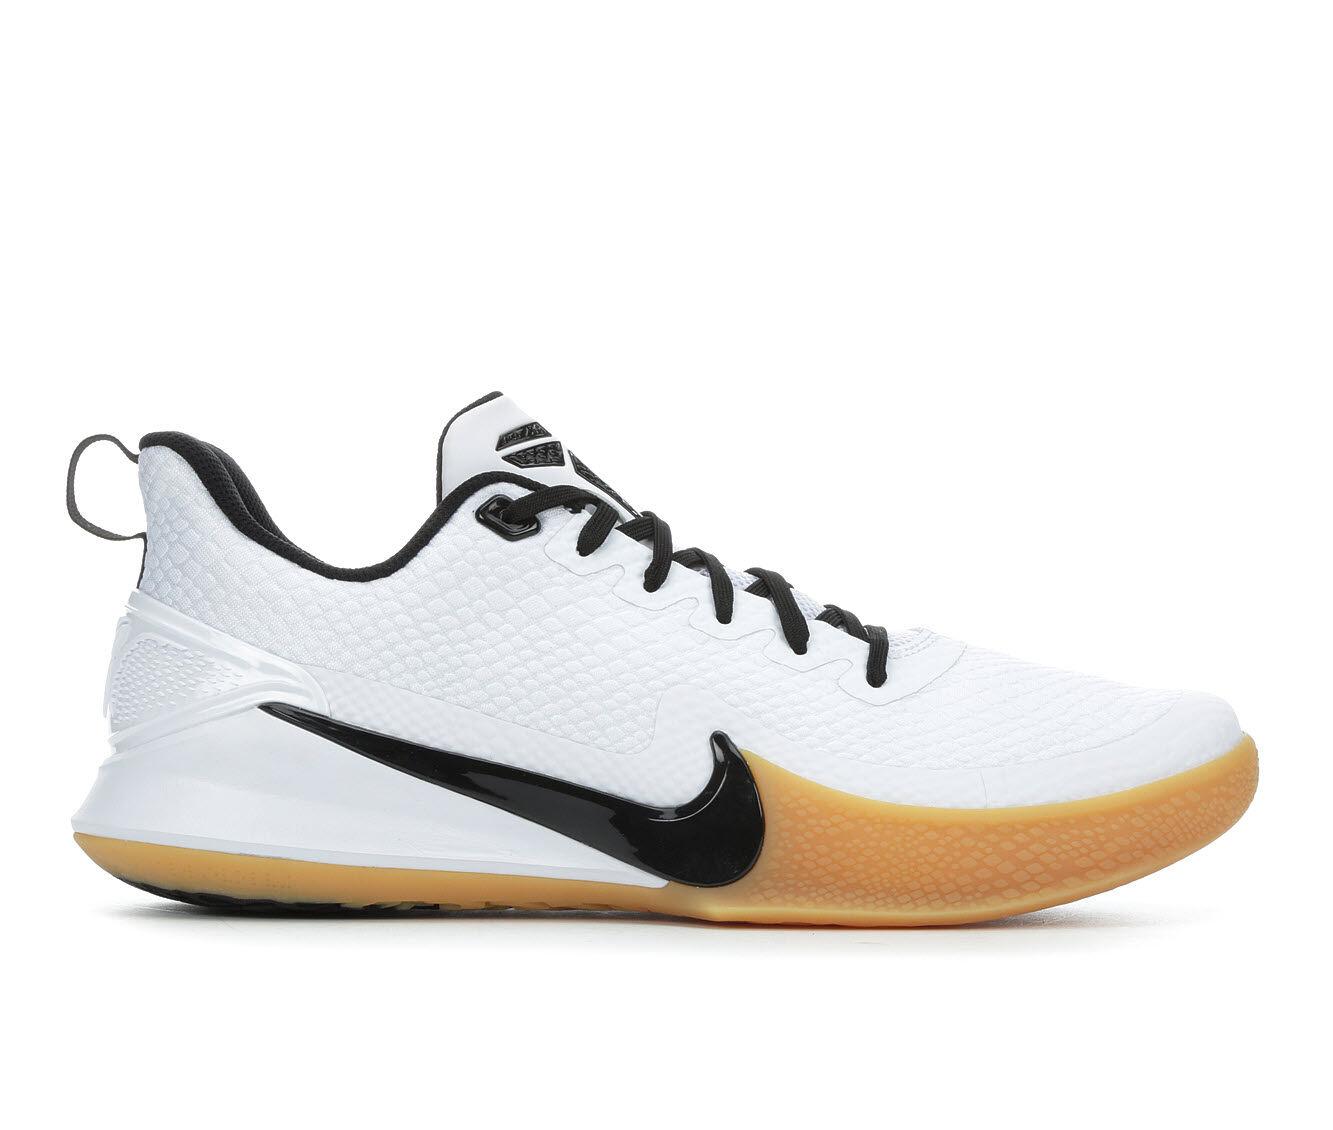 Men's Nike Mamba Rage Basketball Shoes Wht/Blk/Gum 100